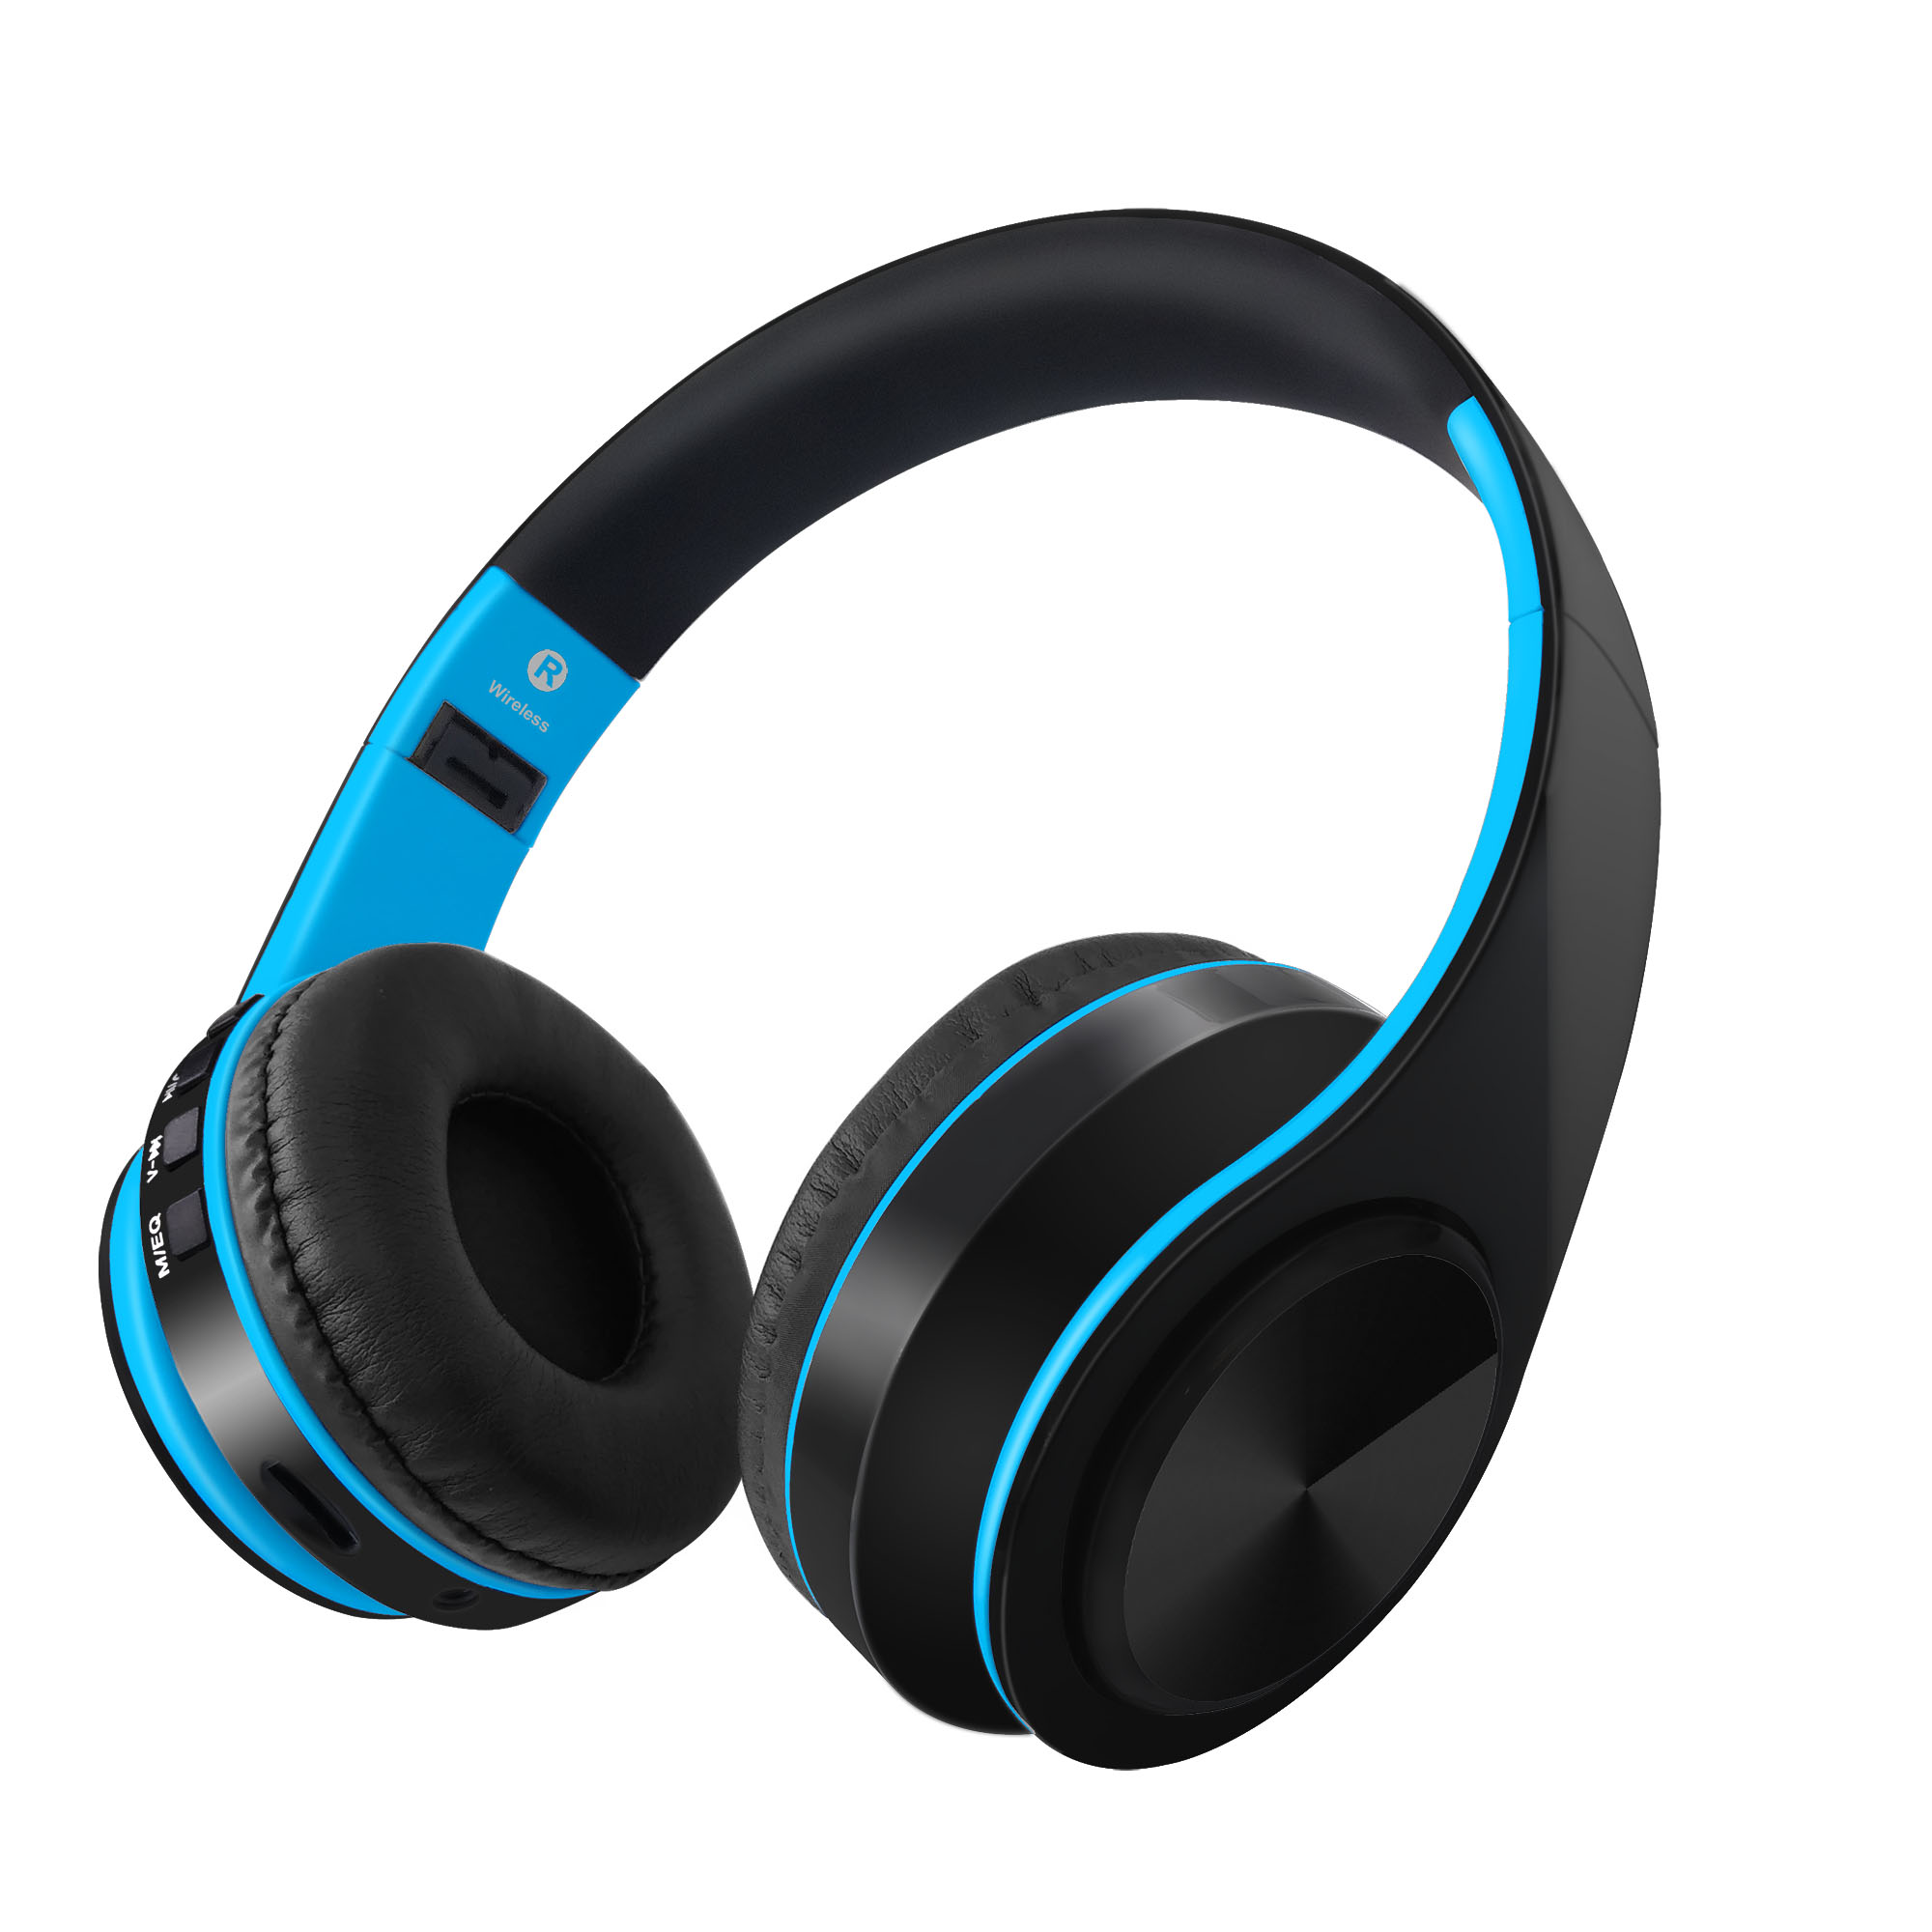 Original Auriculares Fábrica Tv Inalámbrica Bluetooth Para Auriculares Con Micrófono Buy Auriculares Bluetooth Para Ambas Orejas,Auriculares